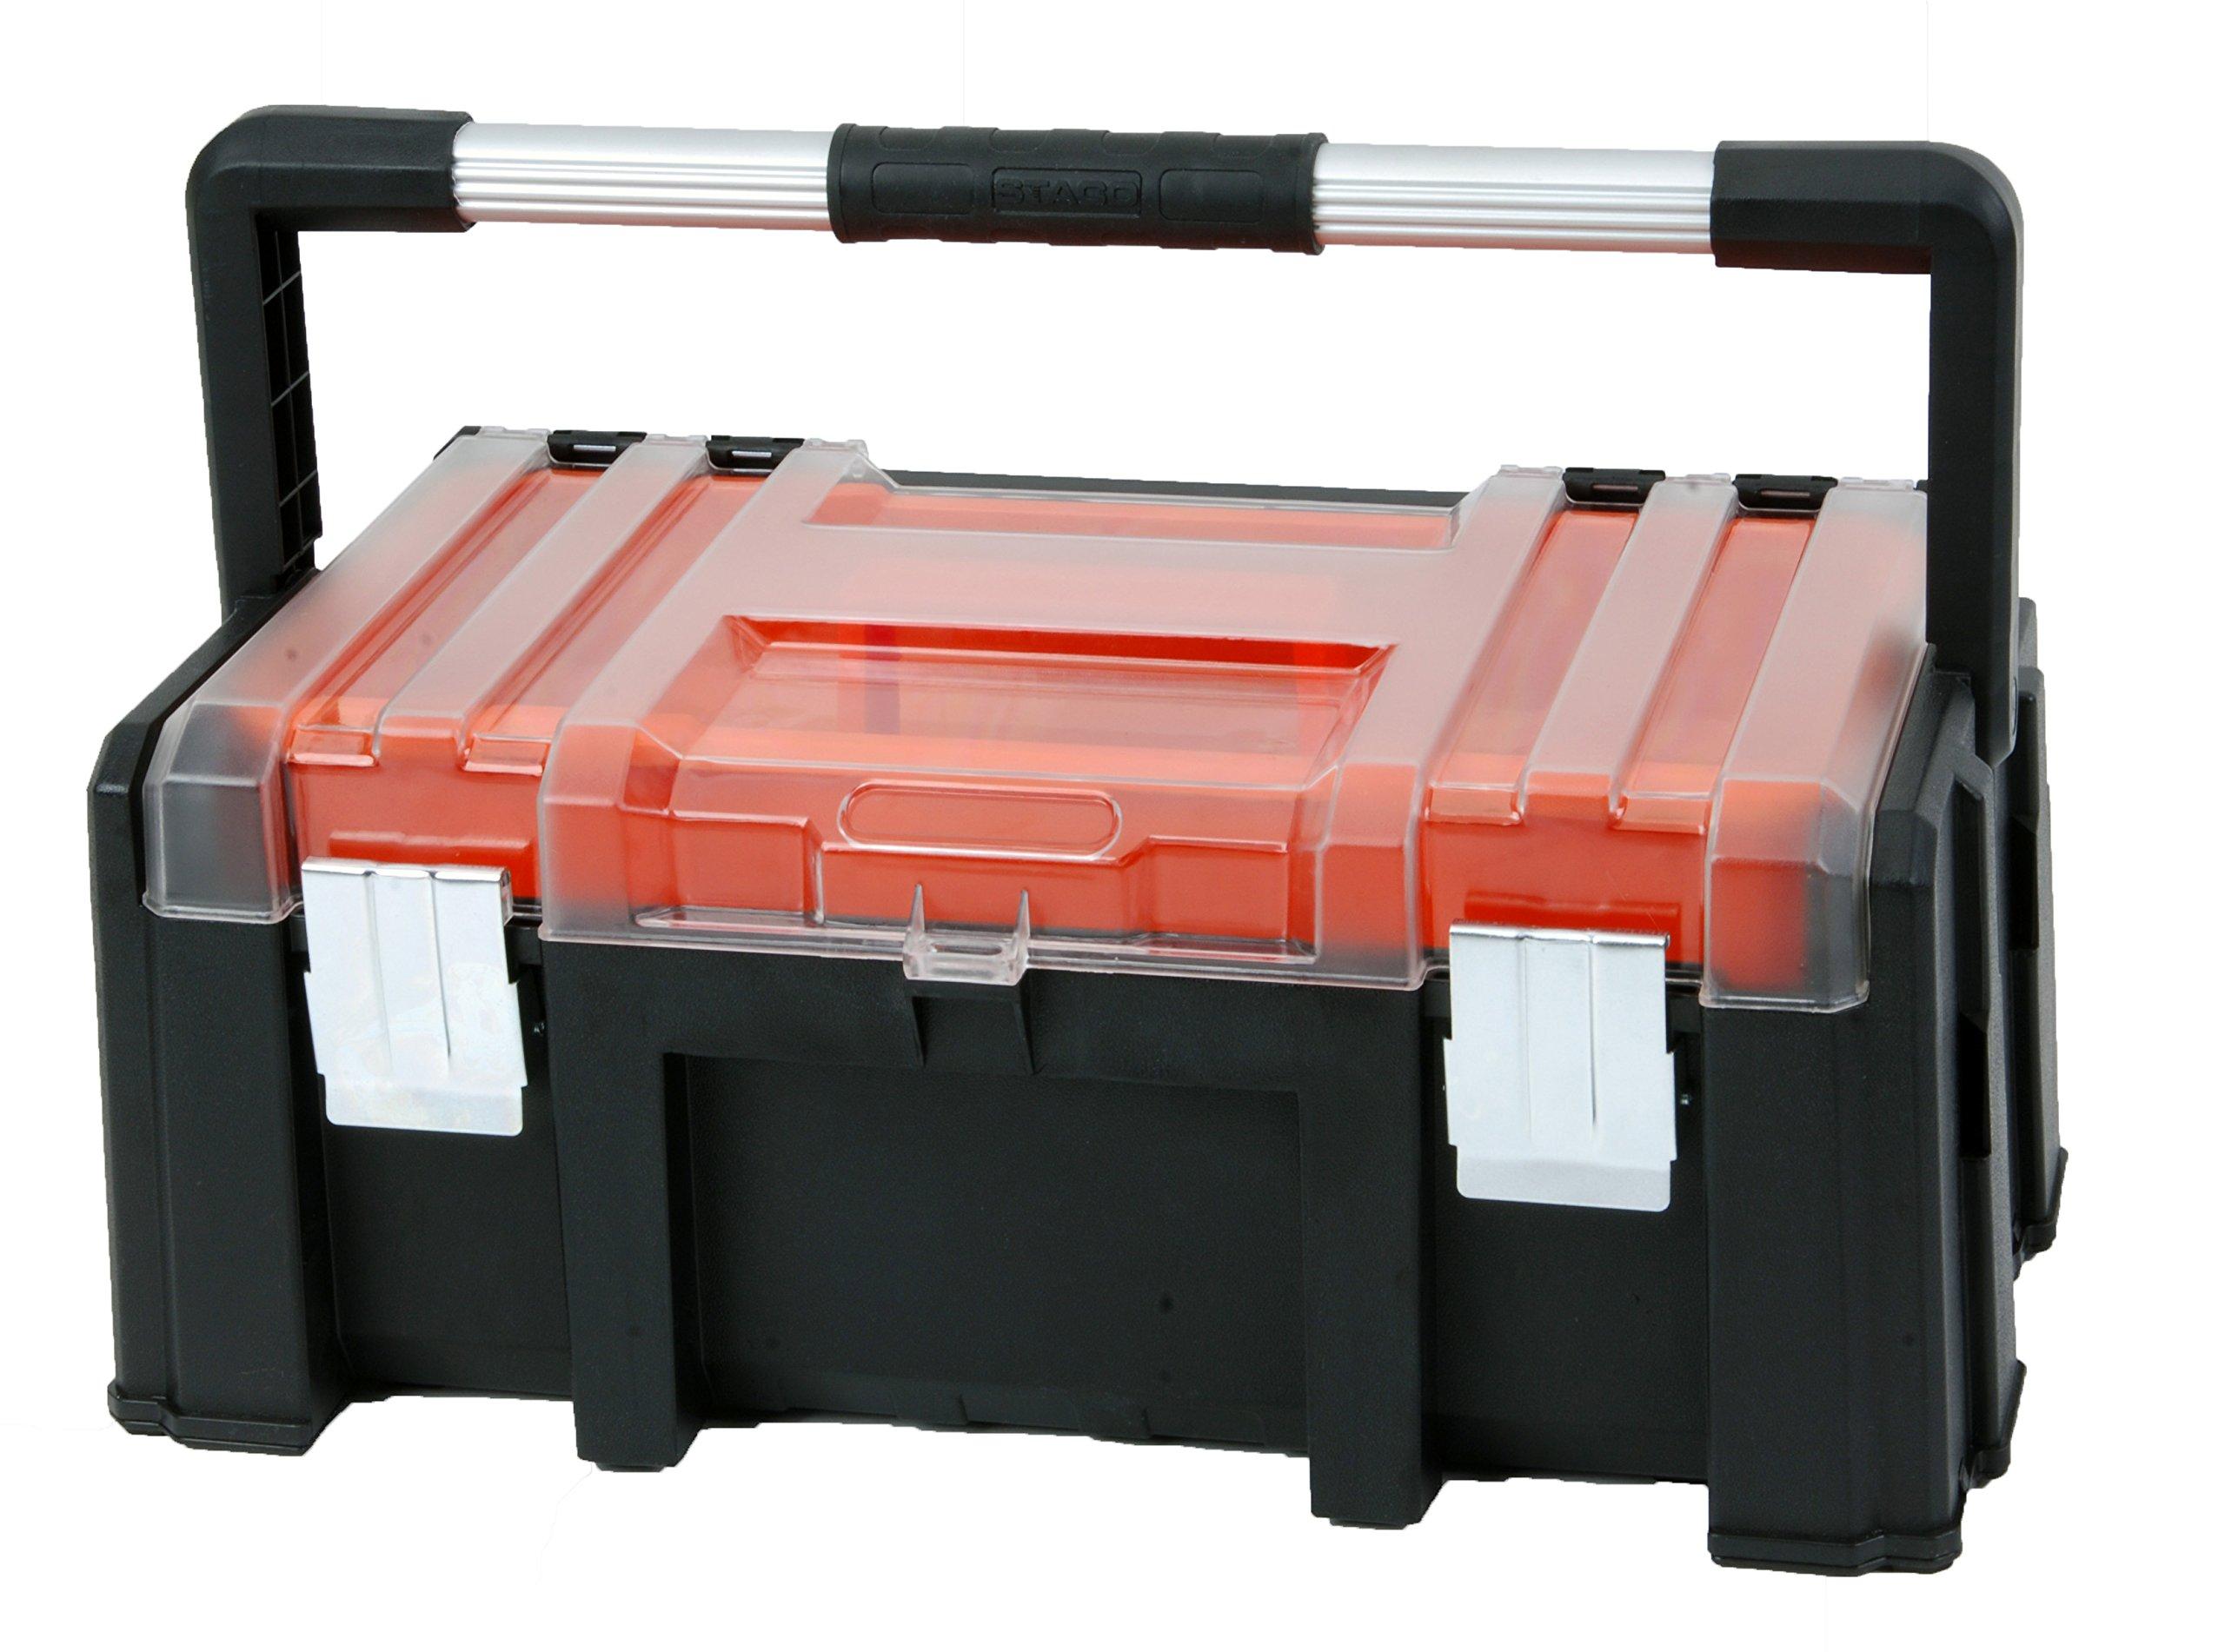 STACO 88324 20-inch Tool Box